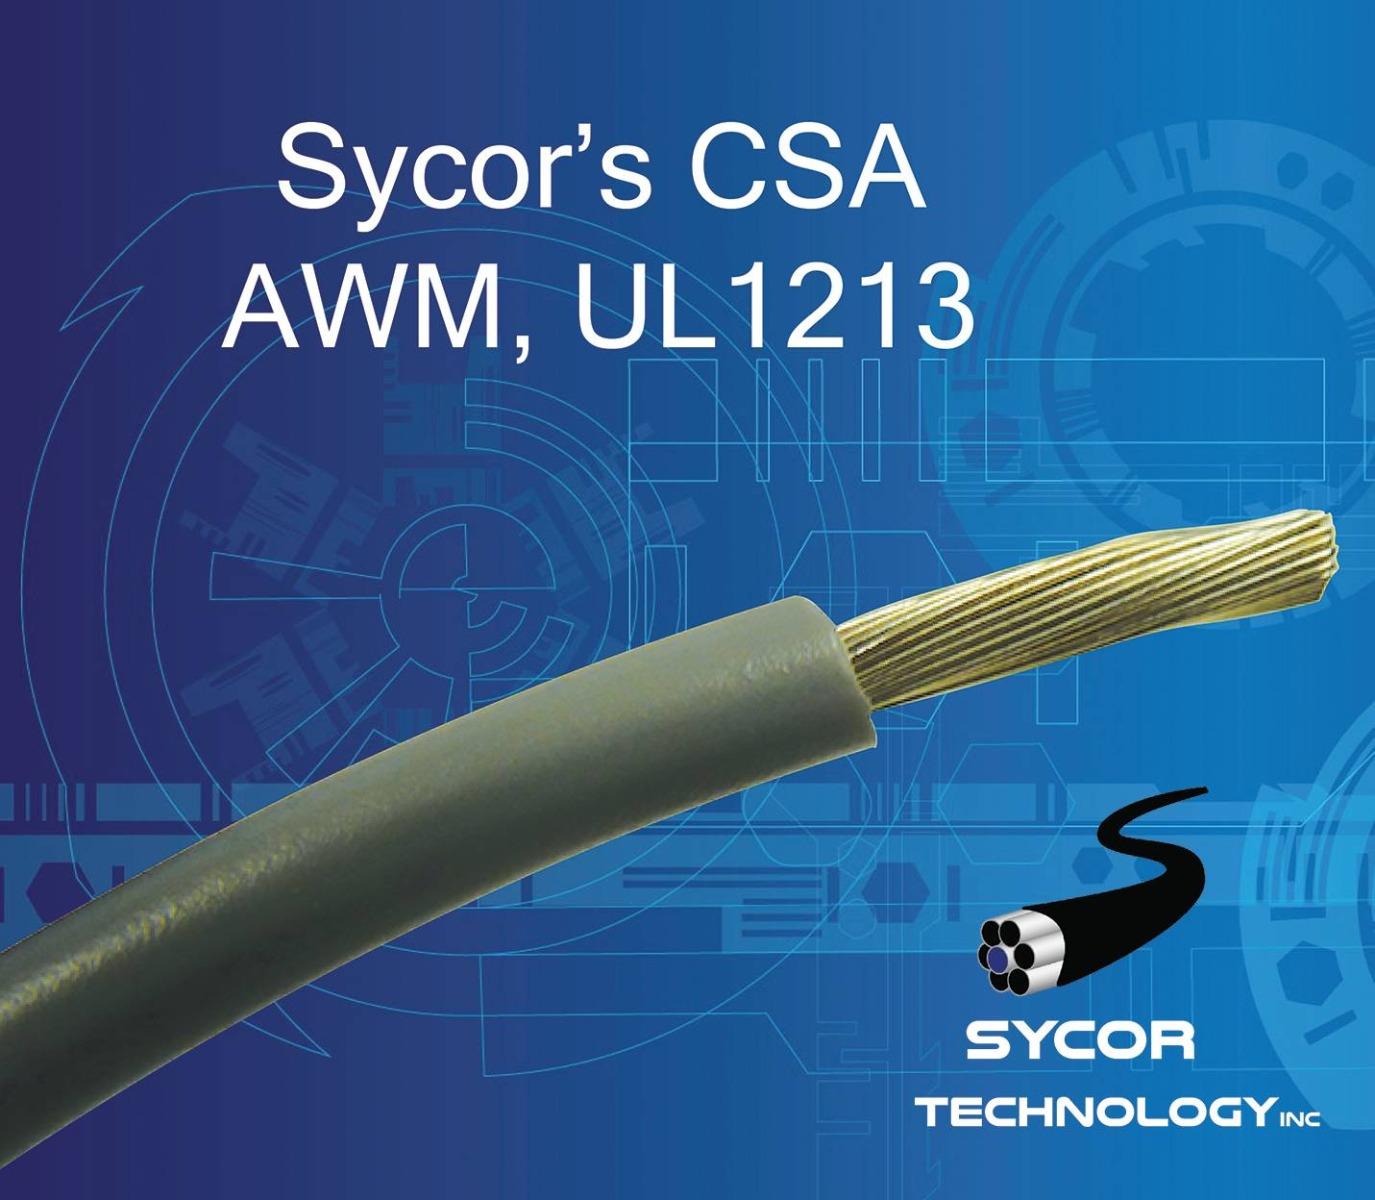 CSA AWM, UL1213